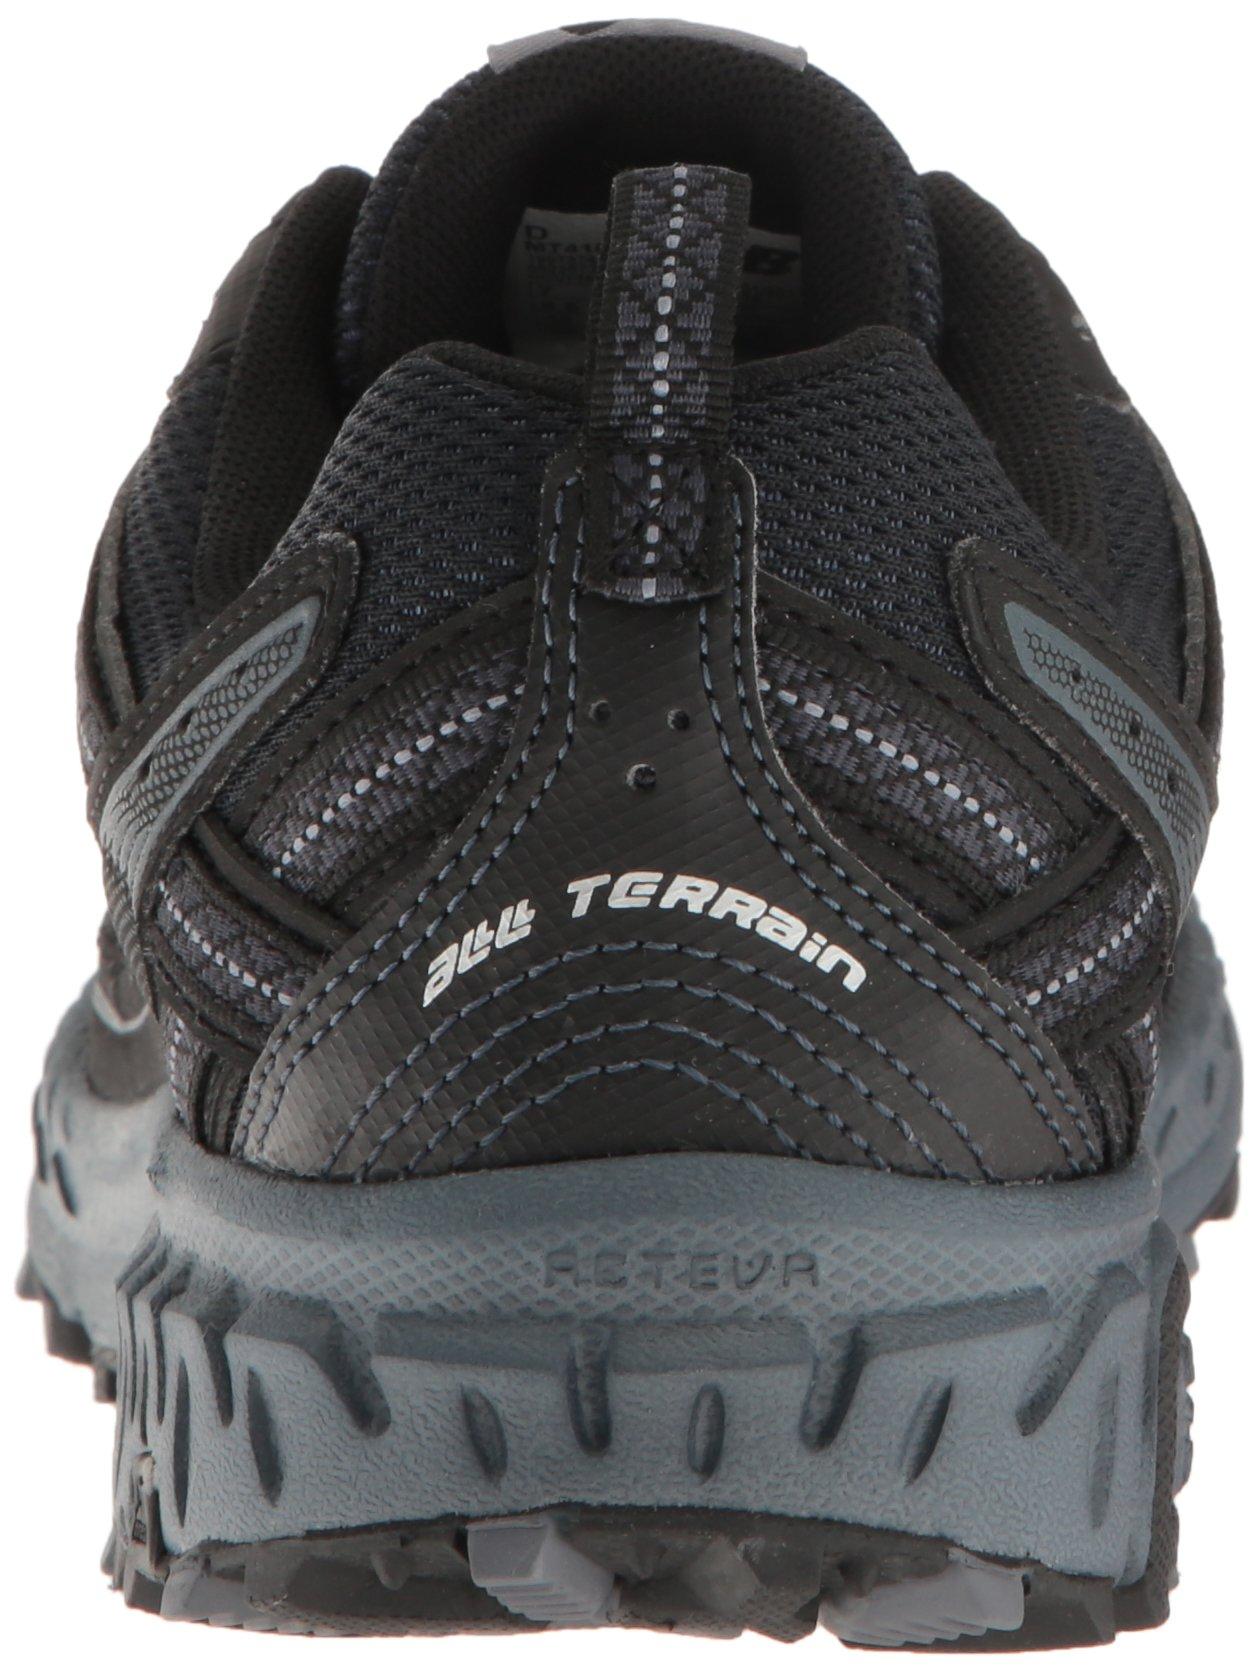 New Balance Men's MT410v5 Cushioning Trail Running Shoe, Black, 7 D US by New Balance (Image #2)